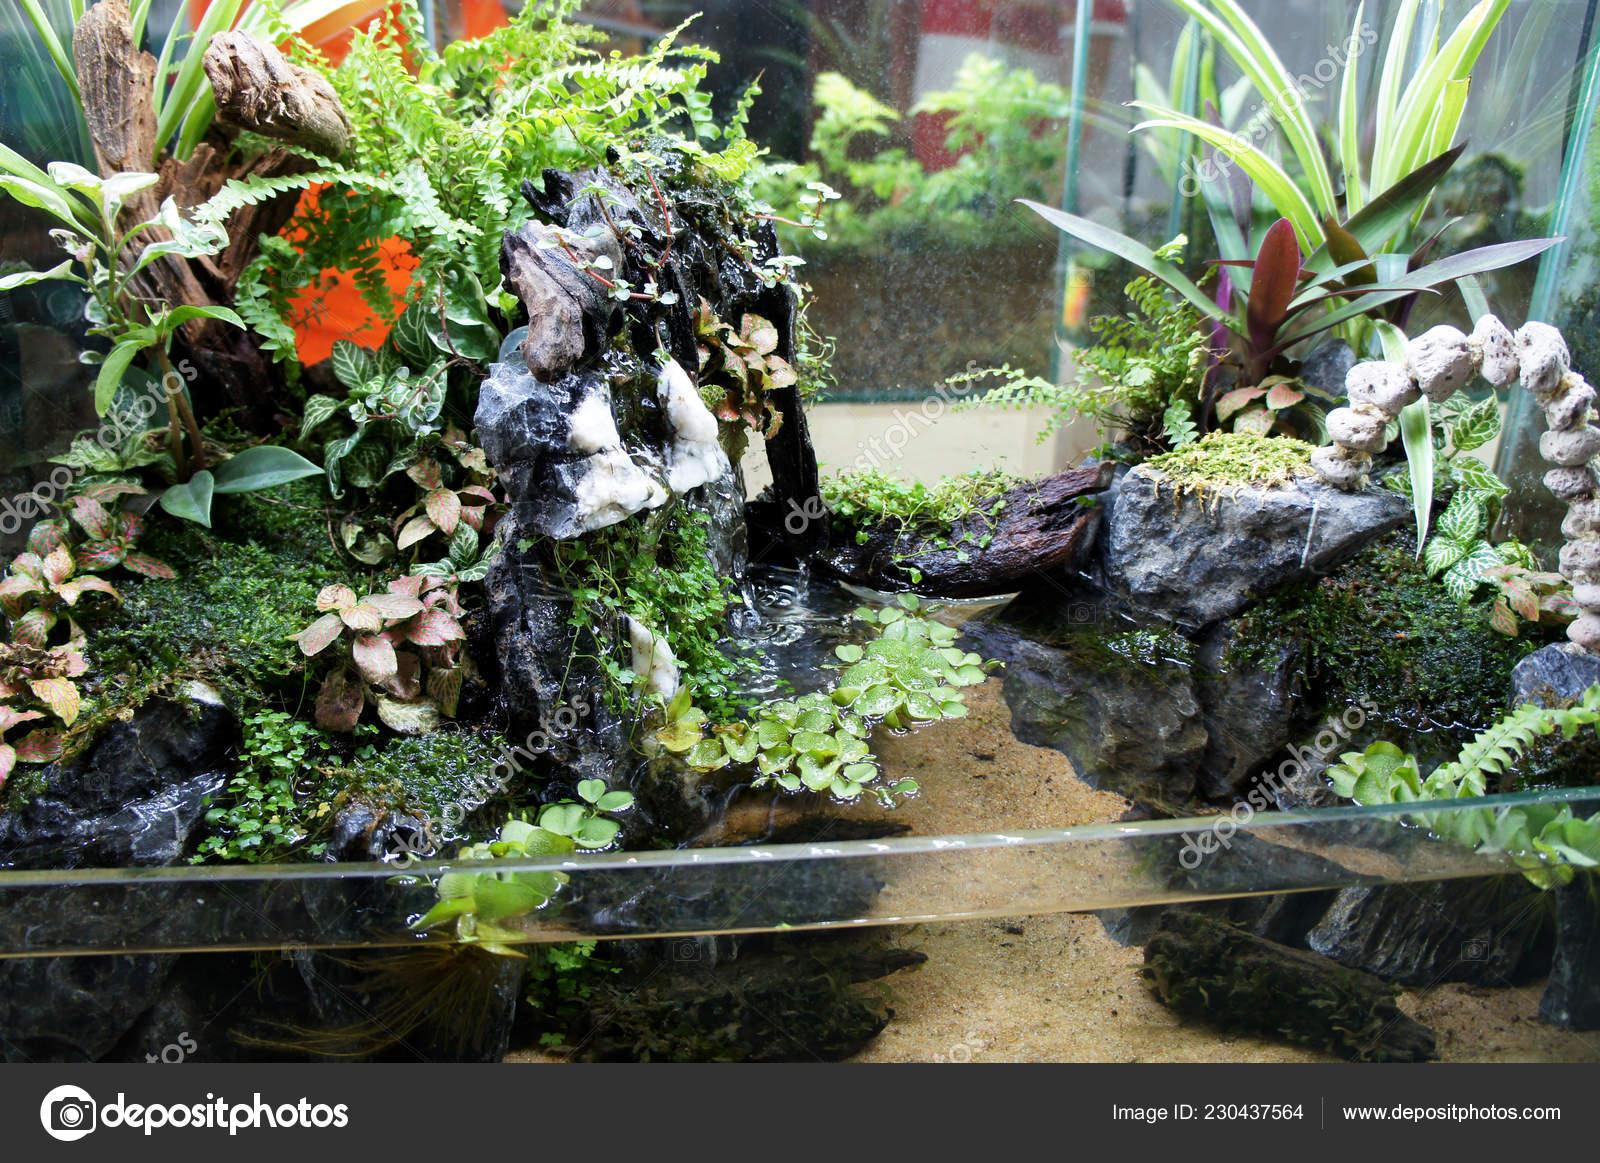 Aquascape Design Small Glass Aquarium Displayed Public Stock Photo C Aisyaqilumar 230437564